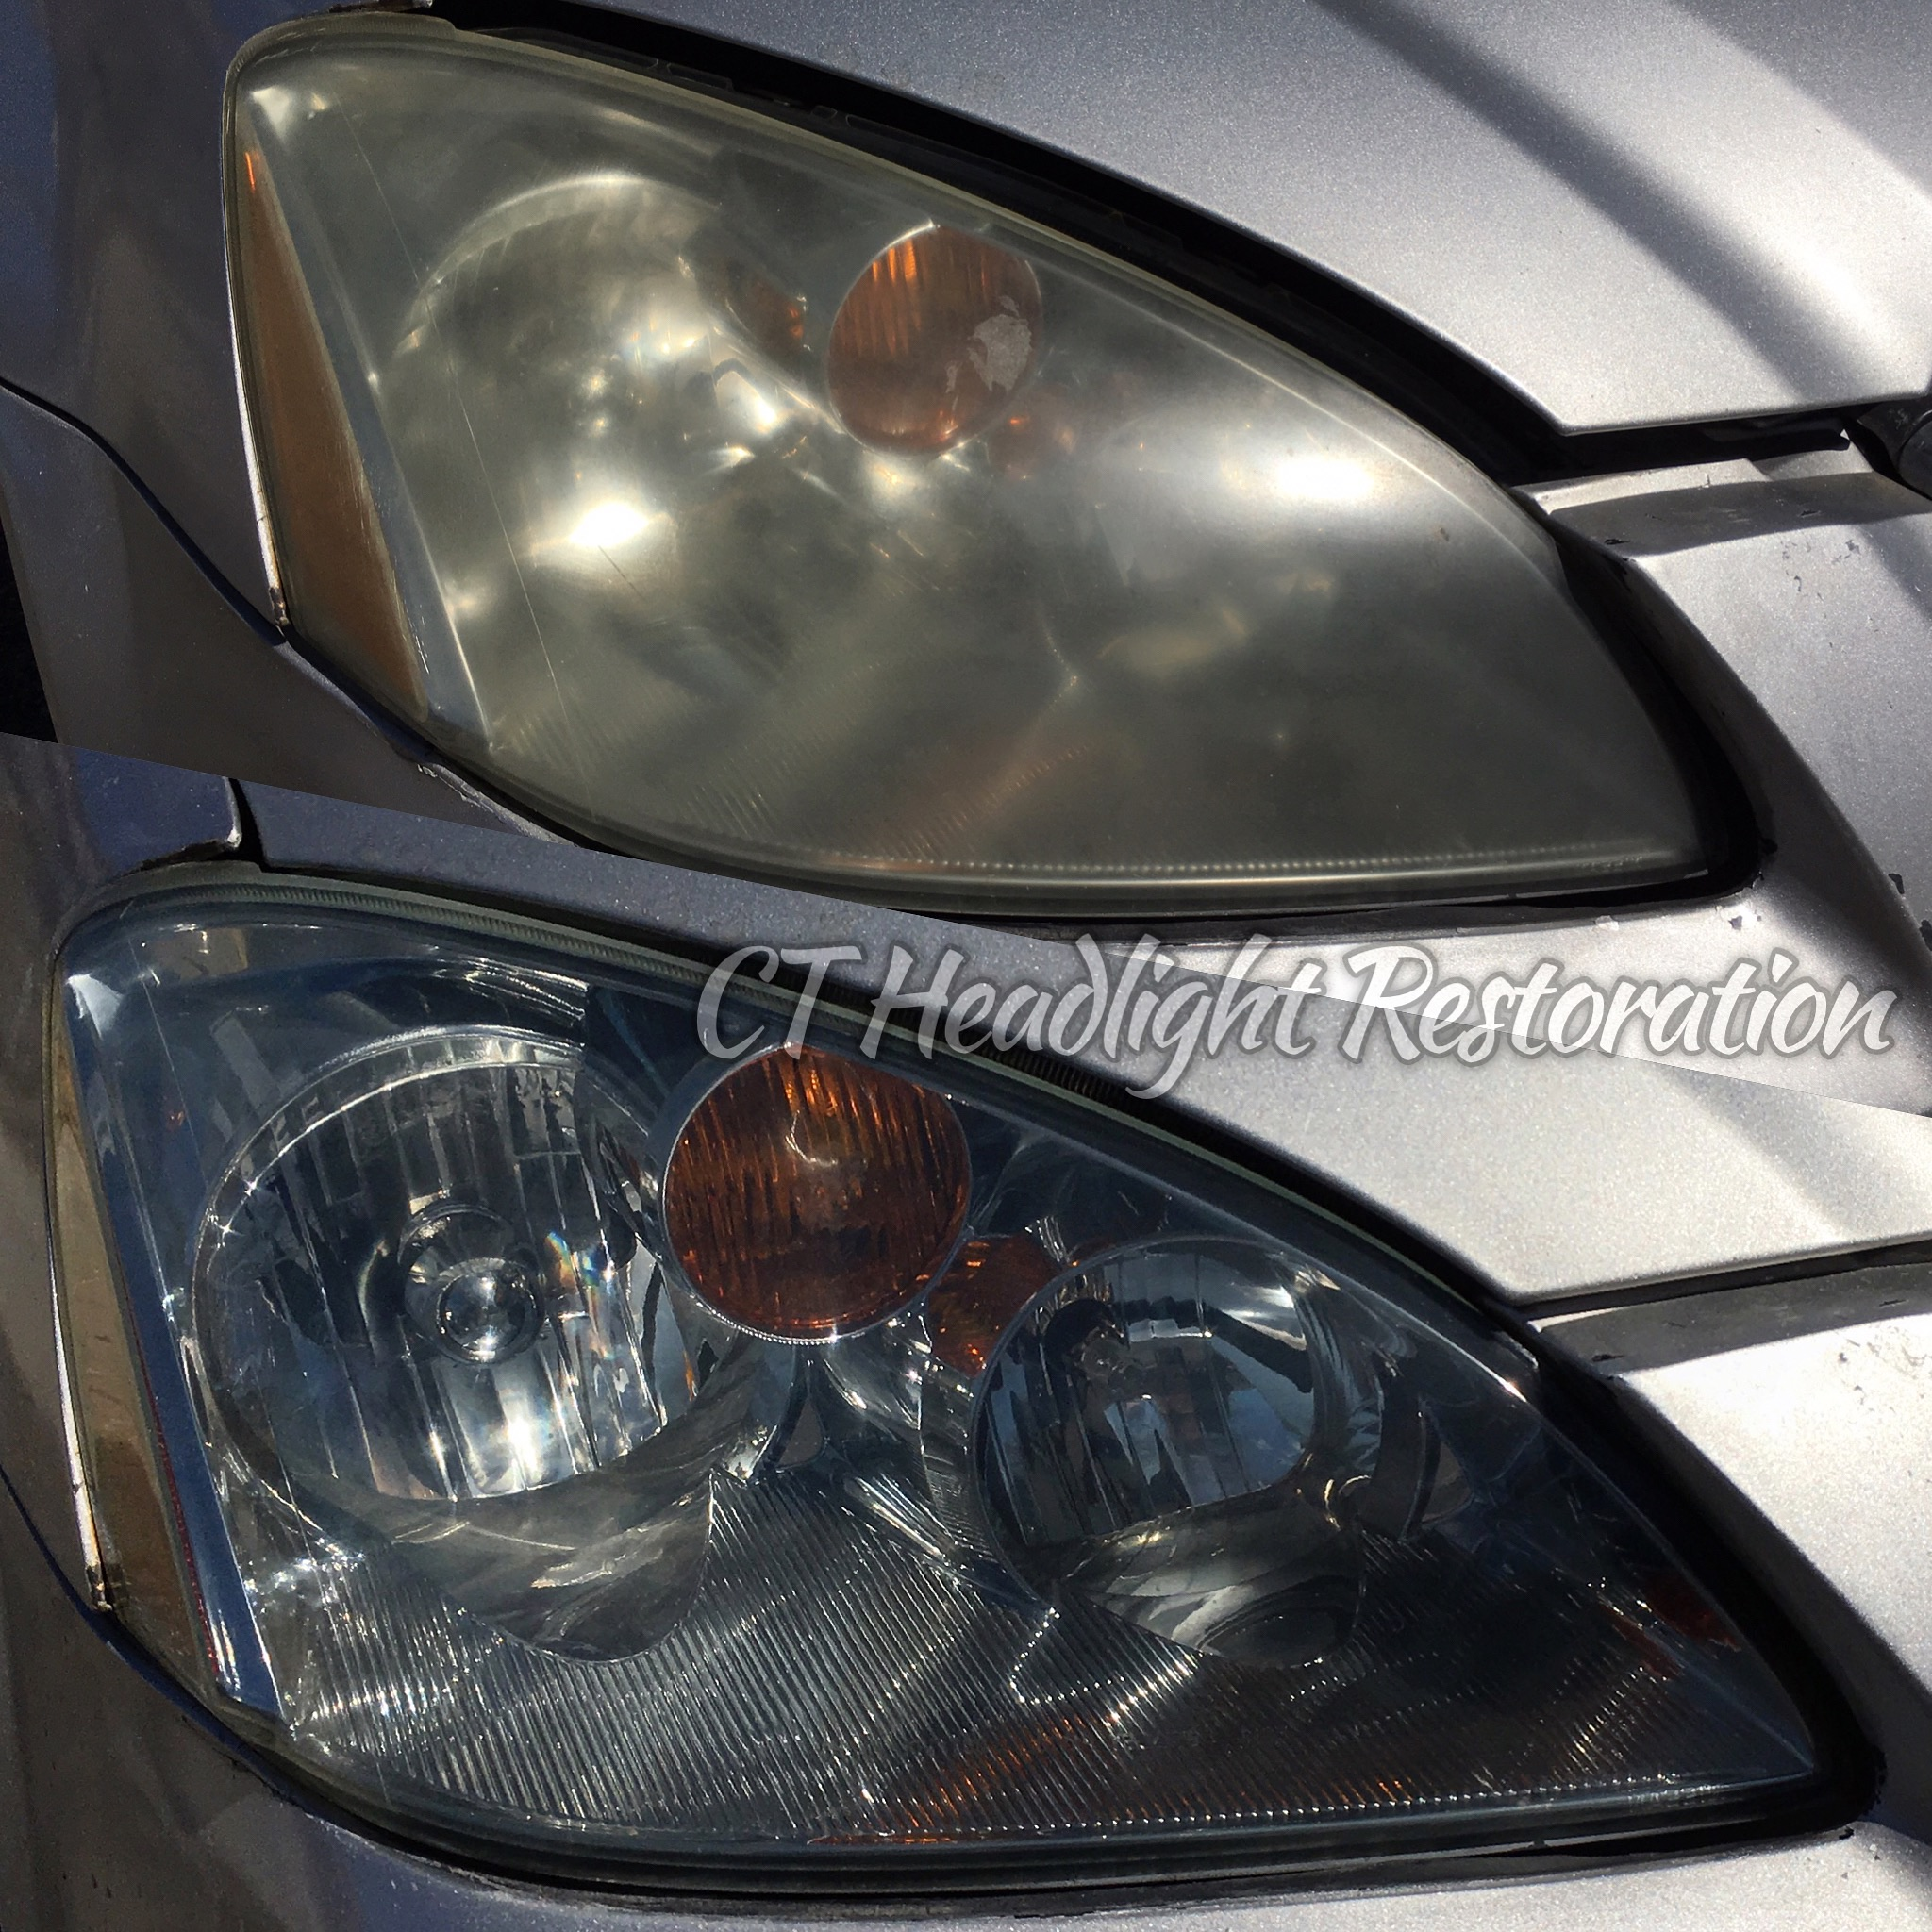 Nissan Altima Foggy Headlight Restoration.jpg